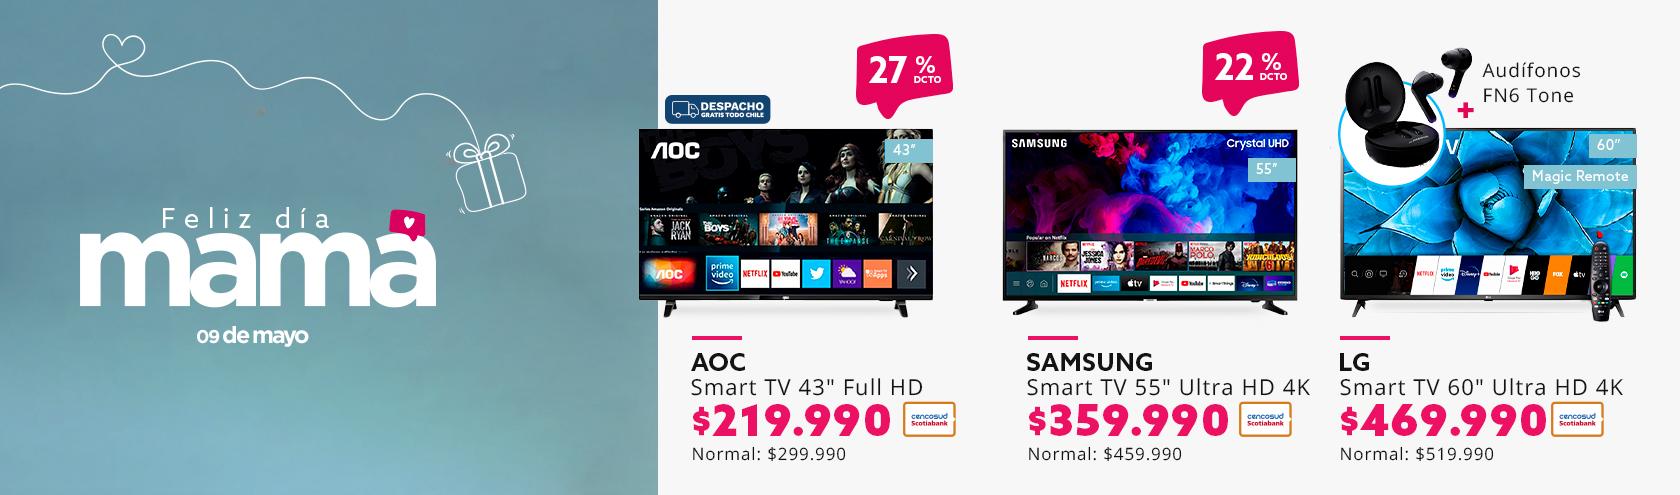 Ofertas en la Smart TV